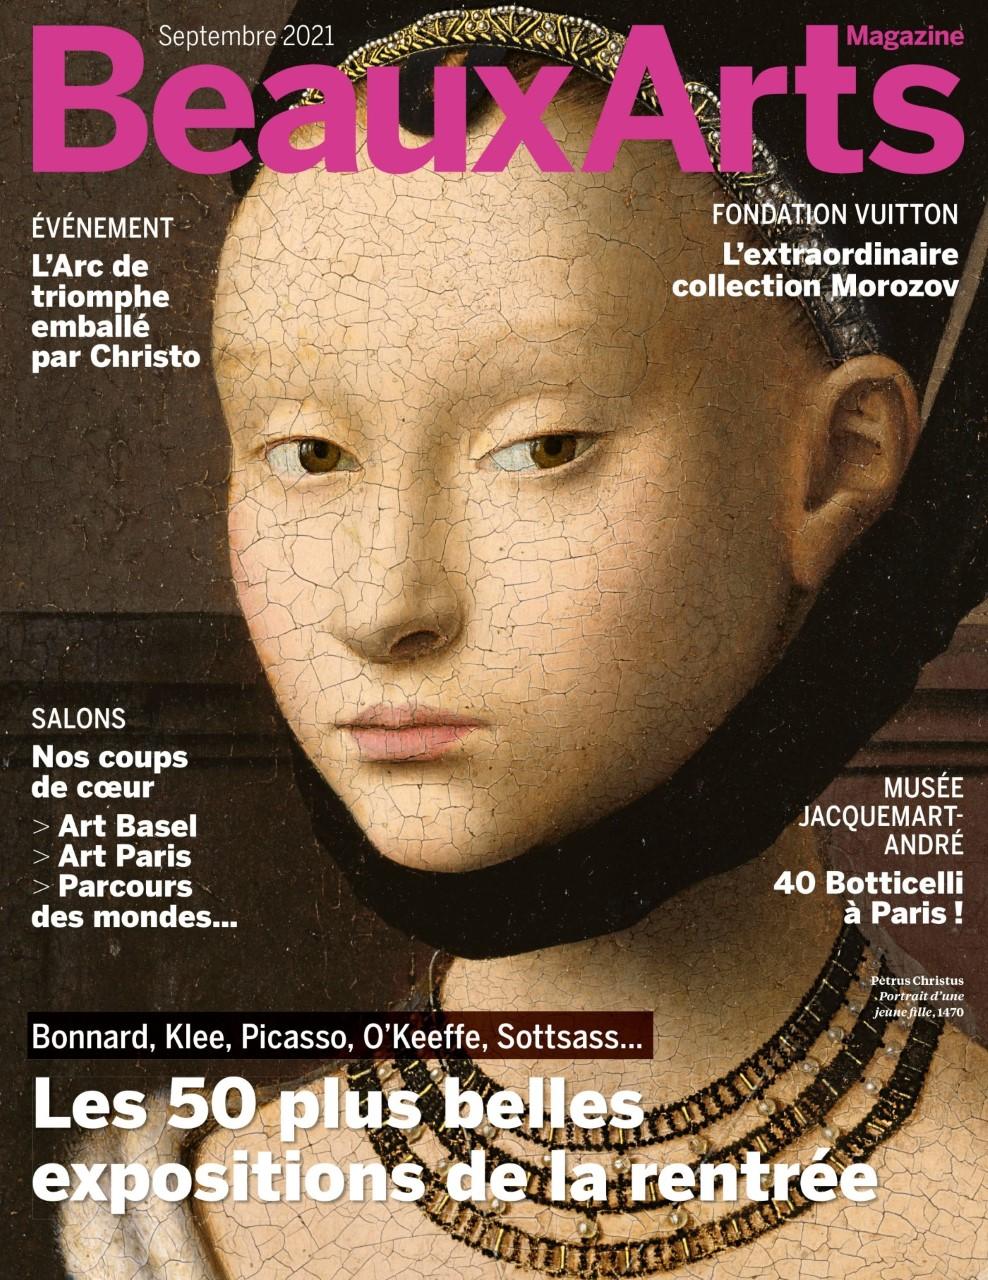 thumbnail_BEAUX-ARTS-magazine-Sept-2021-couv